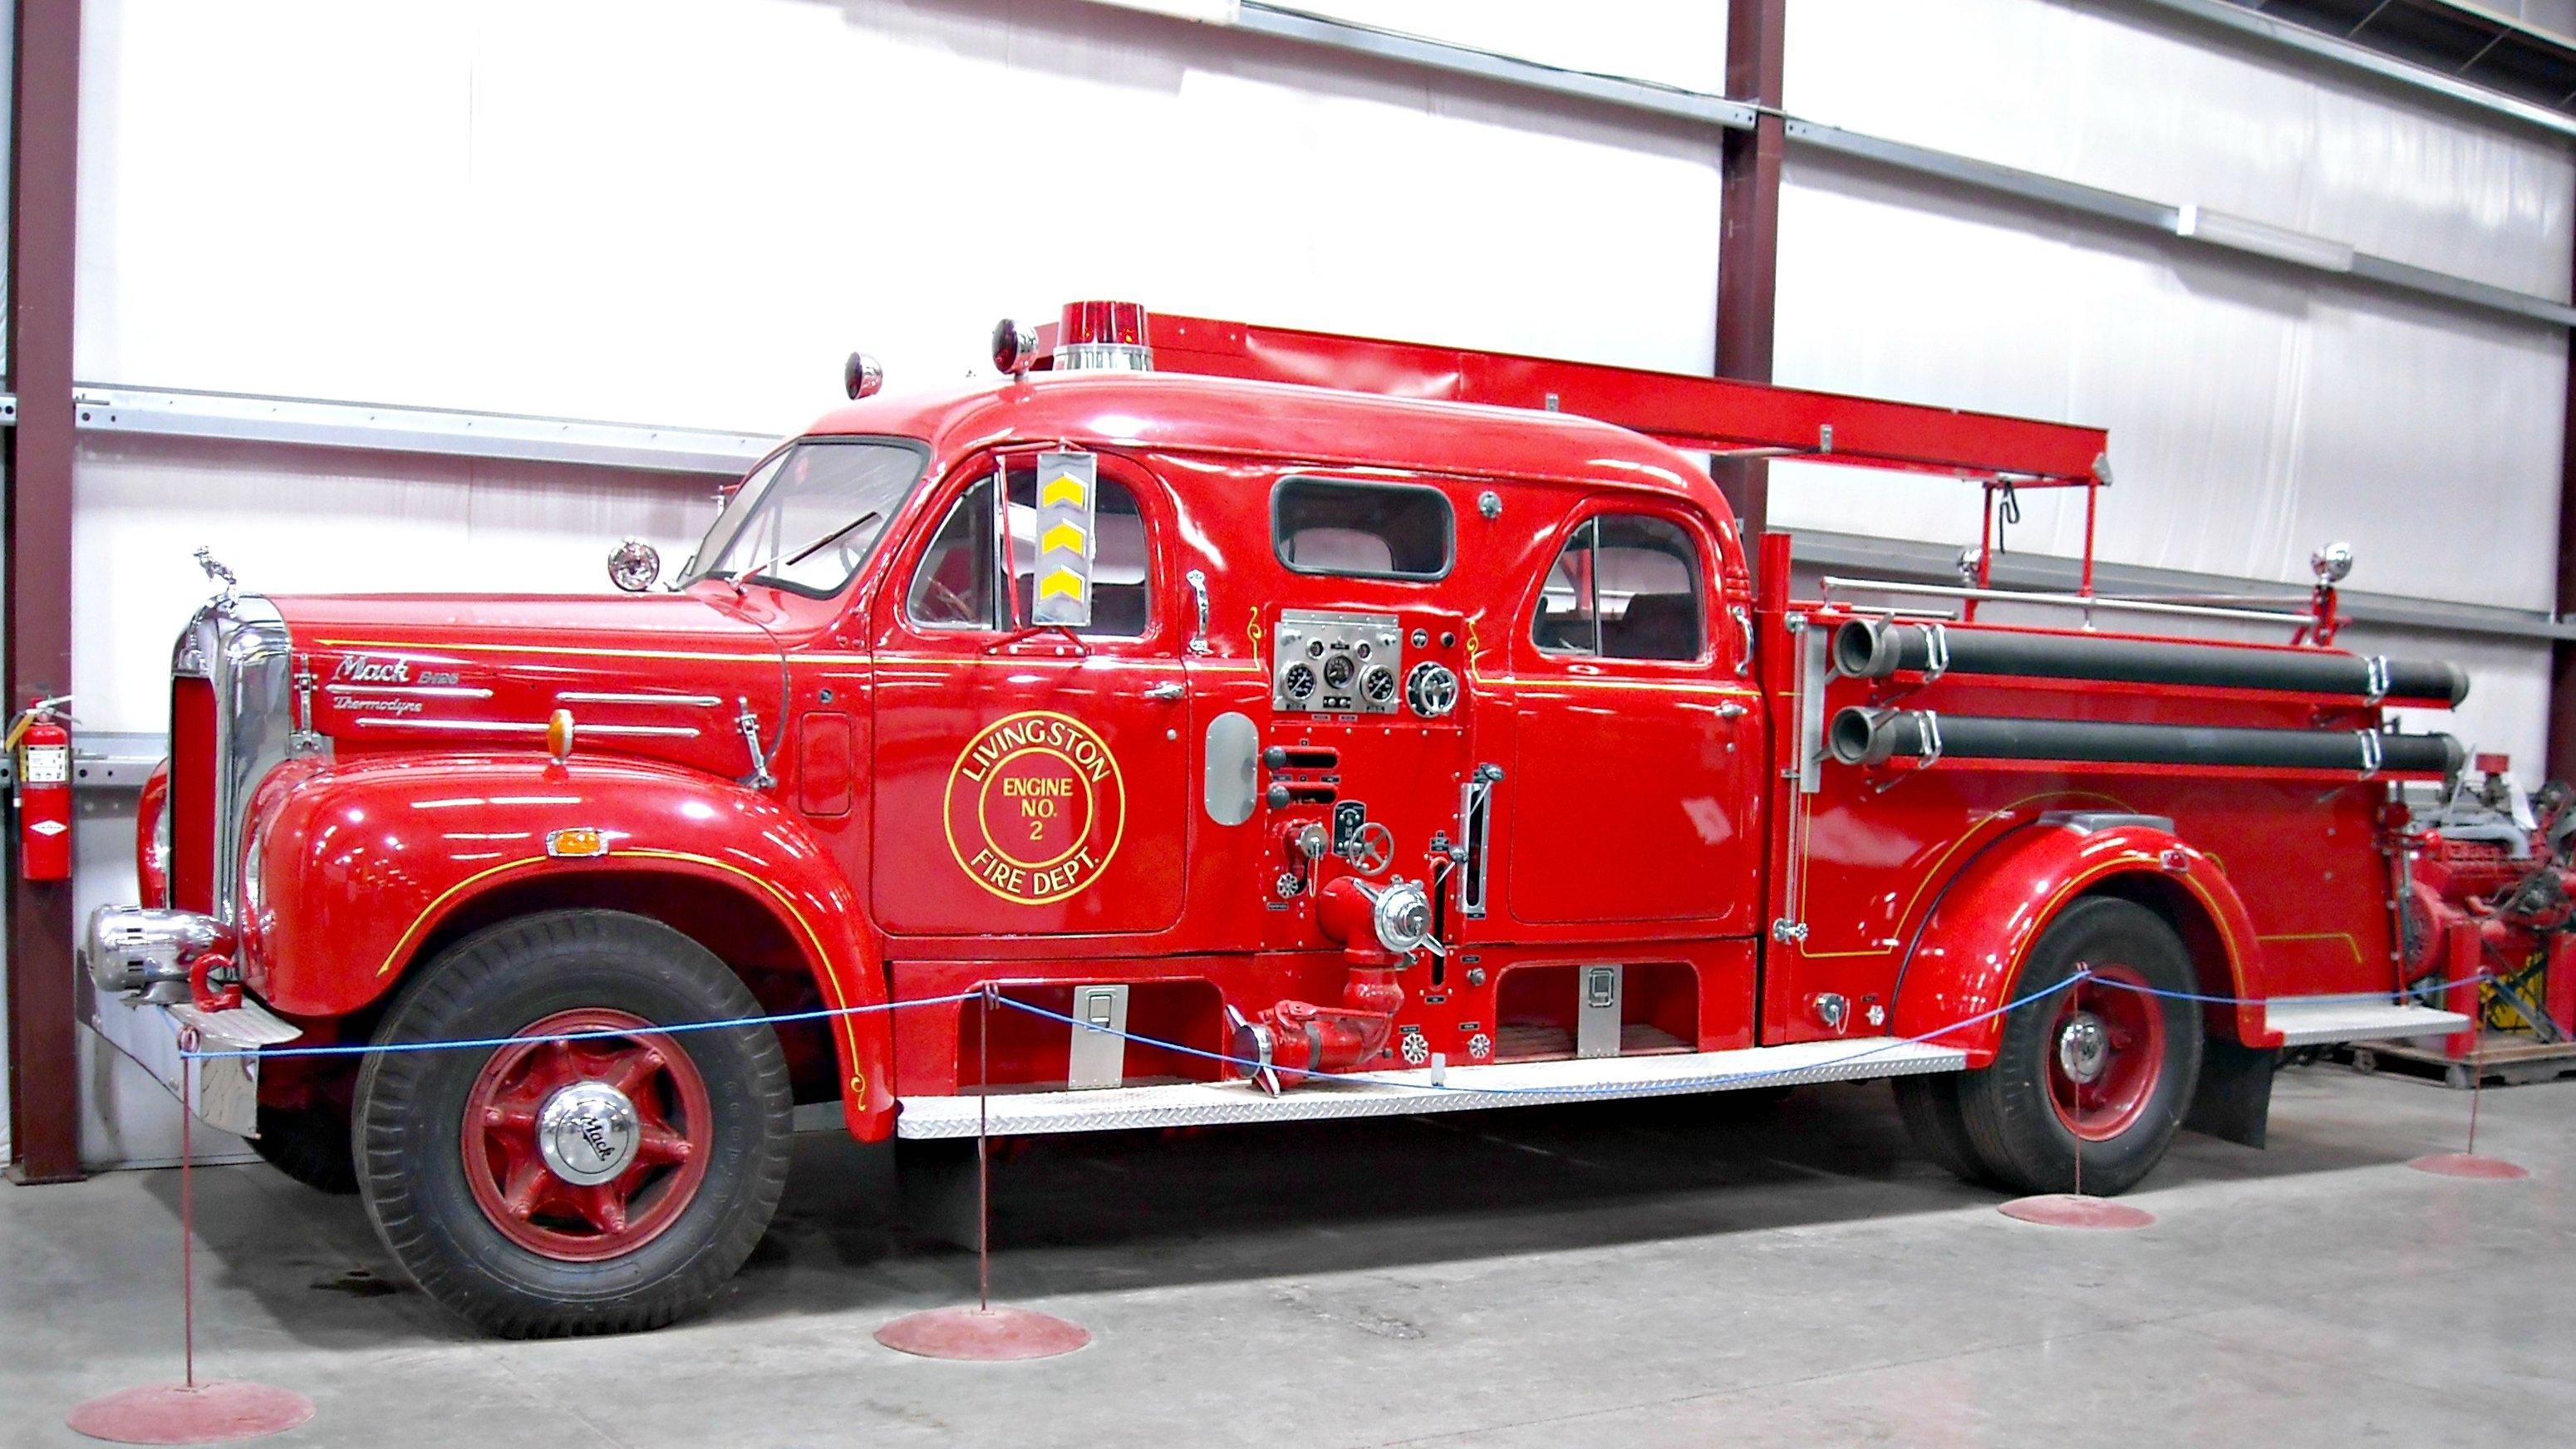 Old Mack Fire Trucks : Mack model b fire truck flickr photo sharing